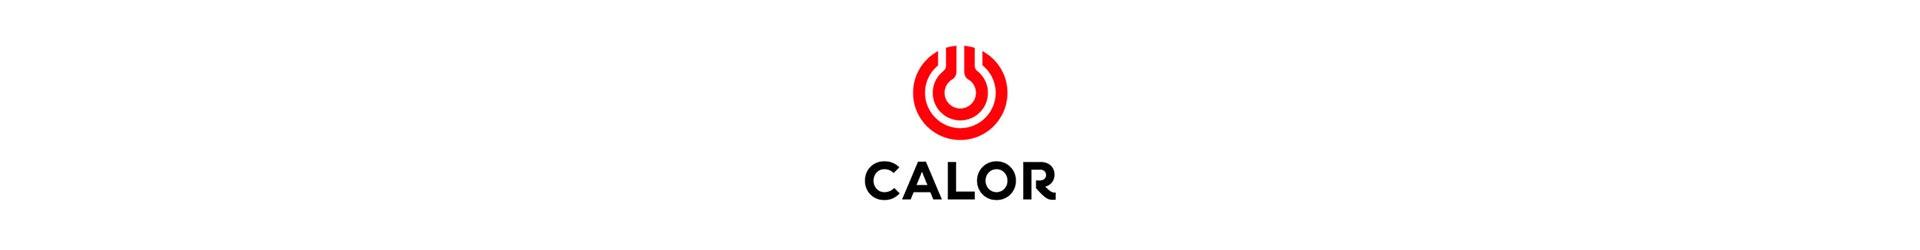 Calor-Banner